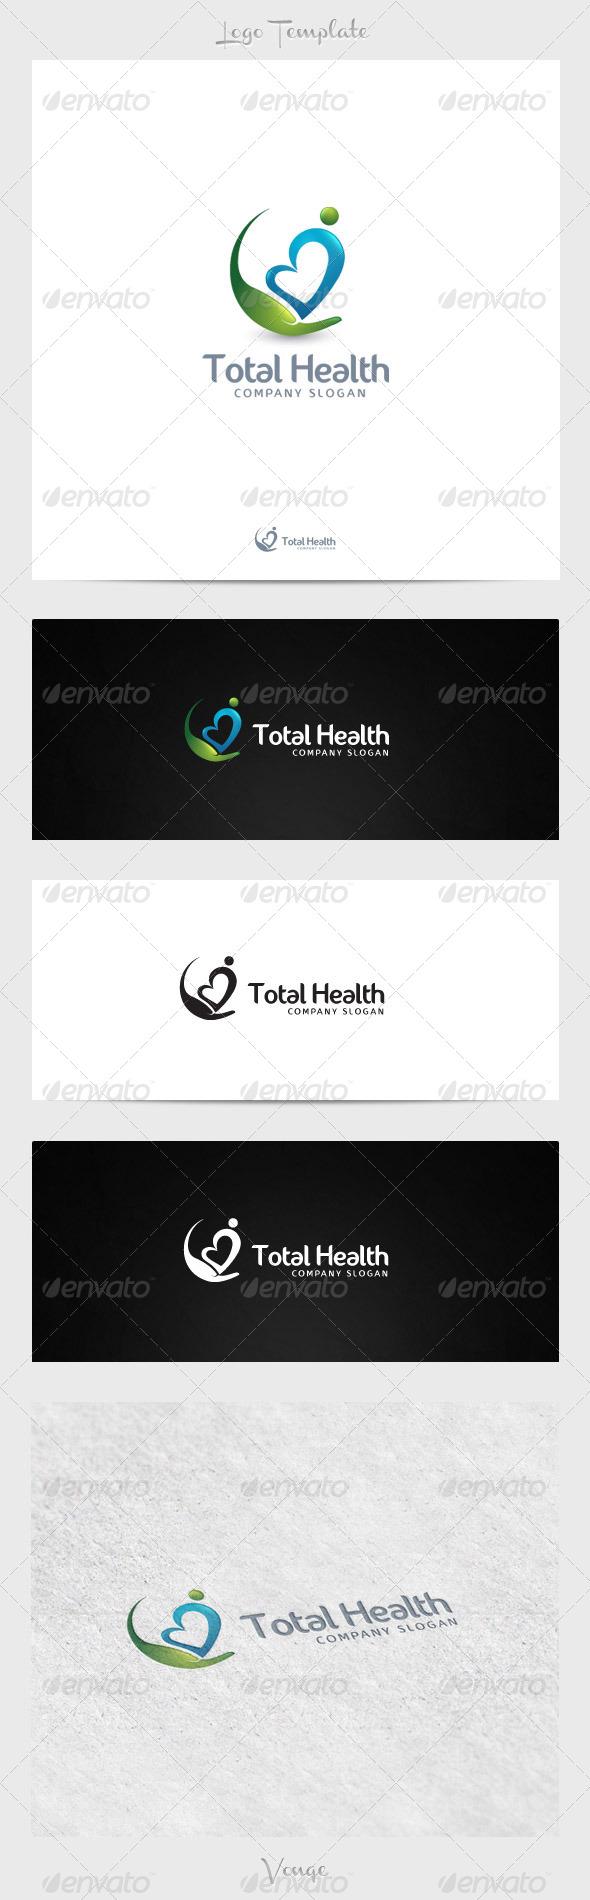 GraphicRiver Total Health 4224347